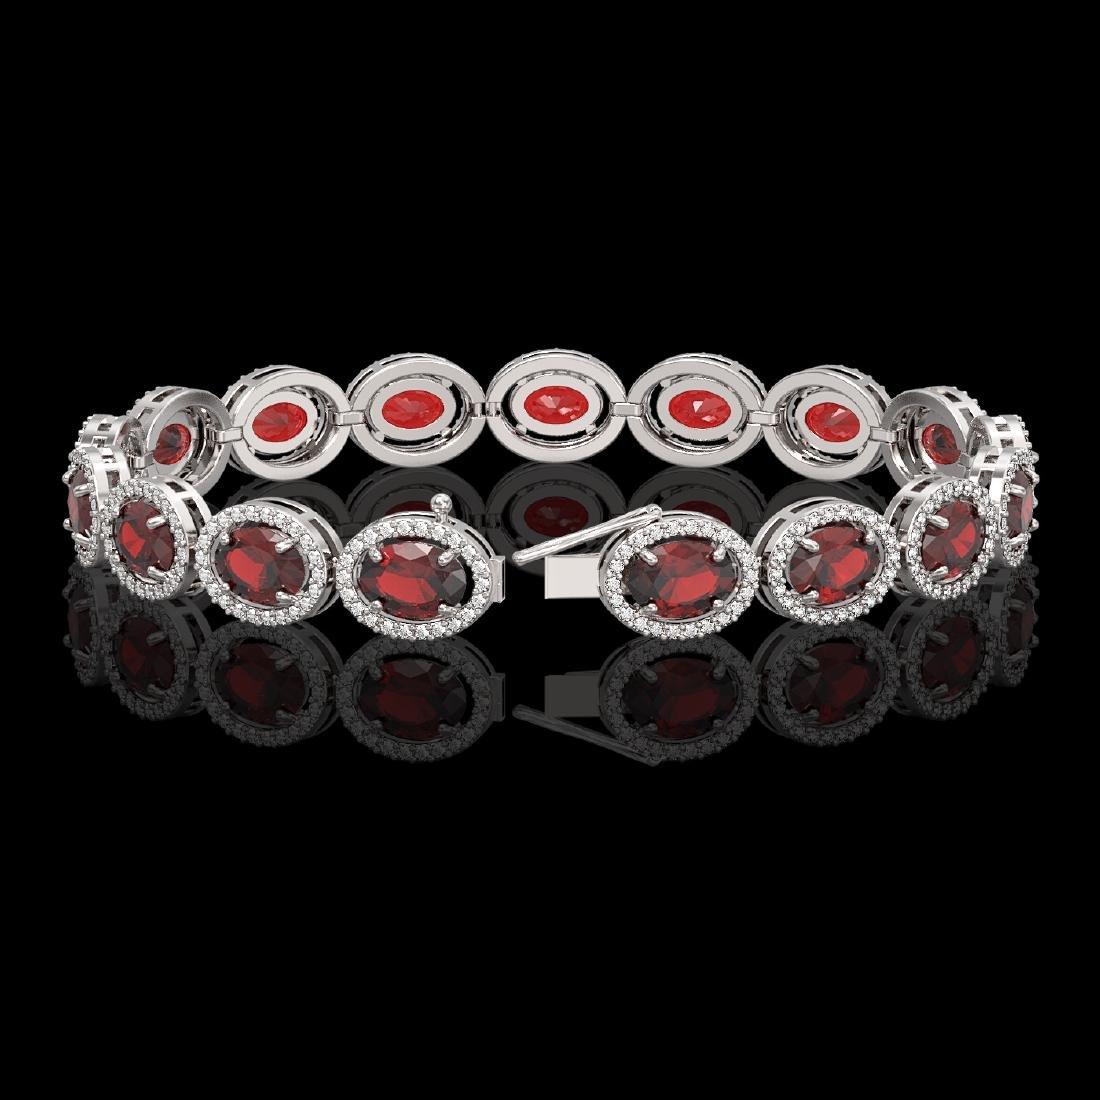 21.98 CTW Garnet & Diamond Halo Bracelet 10K White Gold - 2